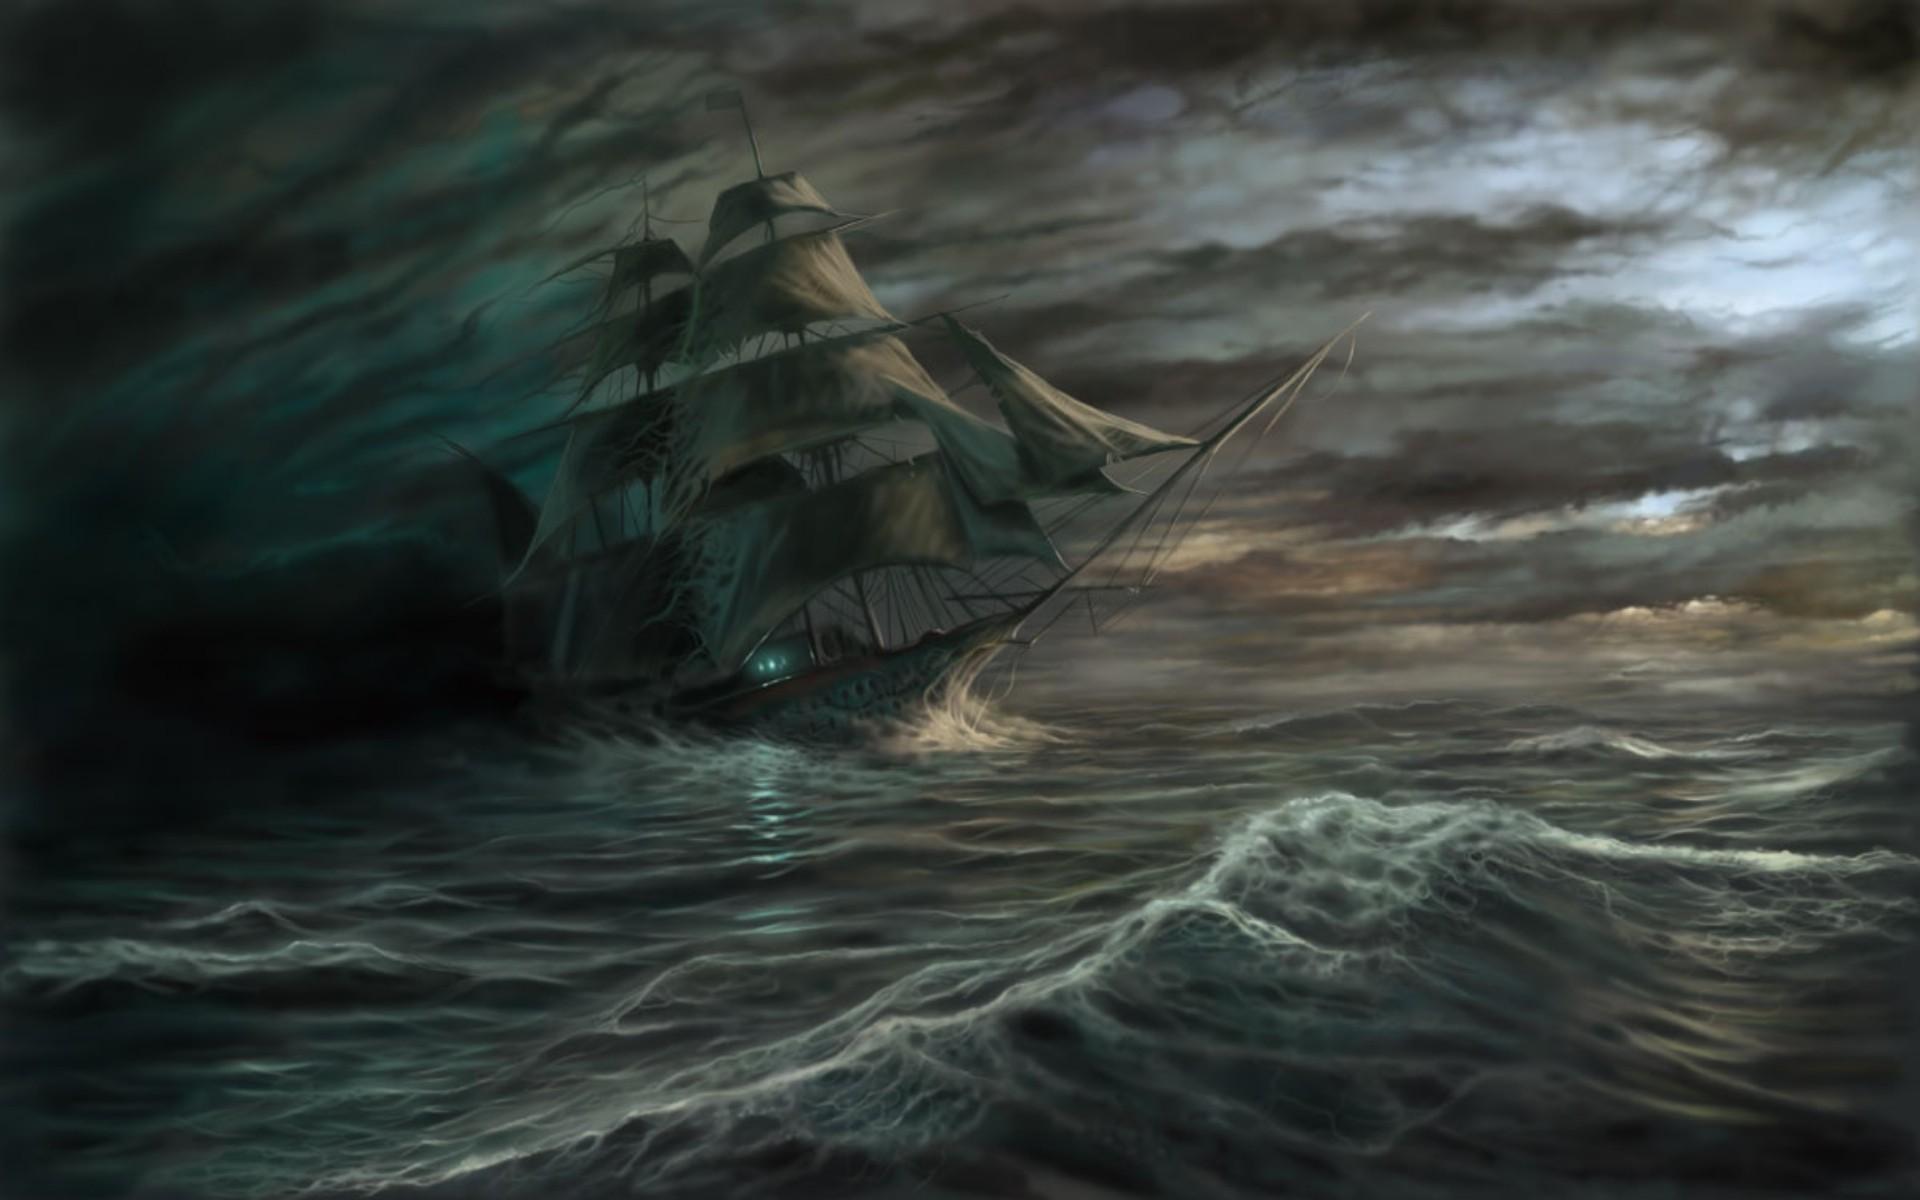 Titanic HD Wallpapers Backgrounds Wallpaper | HD Wallpapers | Pinterest |  Titanic ship, Hd wallpaper and Wallpaper